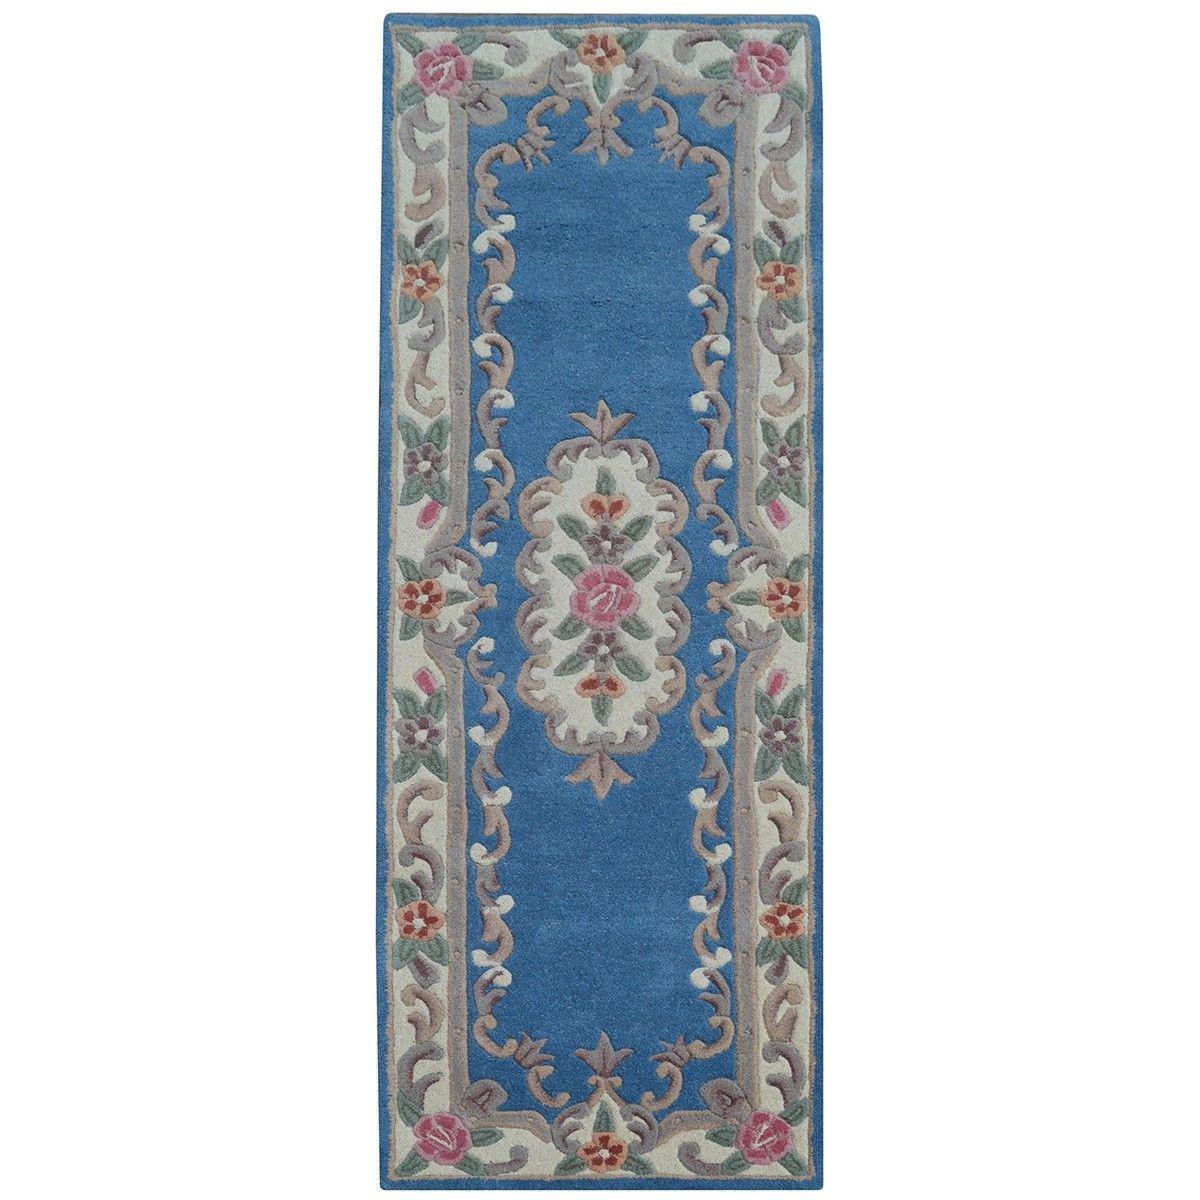 Avalon French Aubusson Wool Runner Rug, 210x67cm, Blue